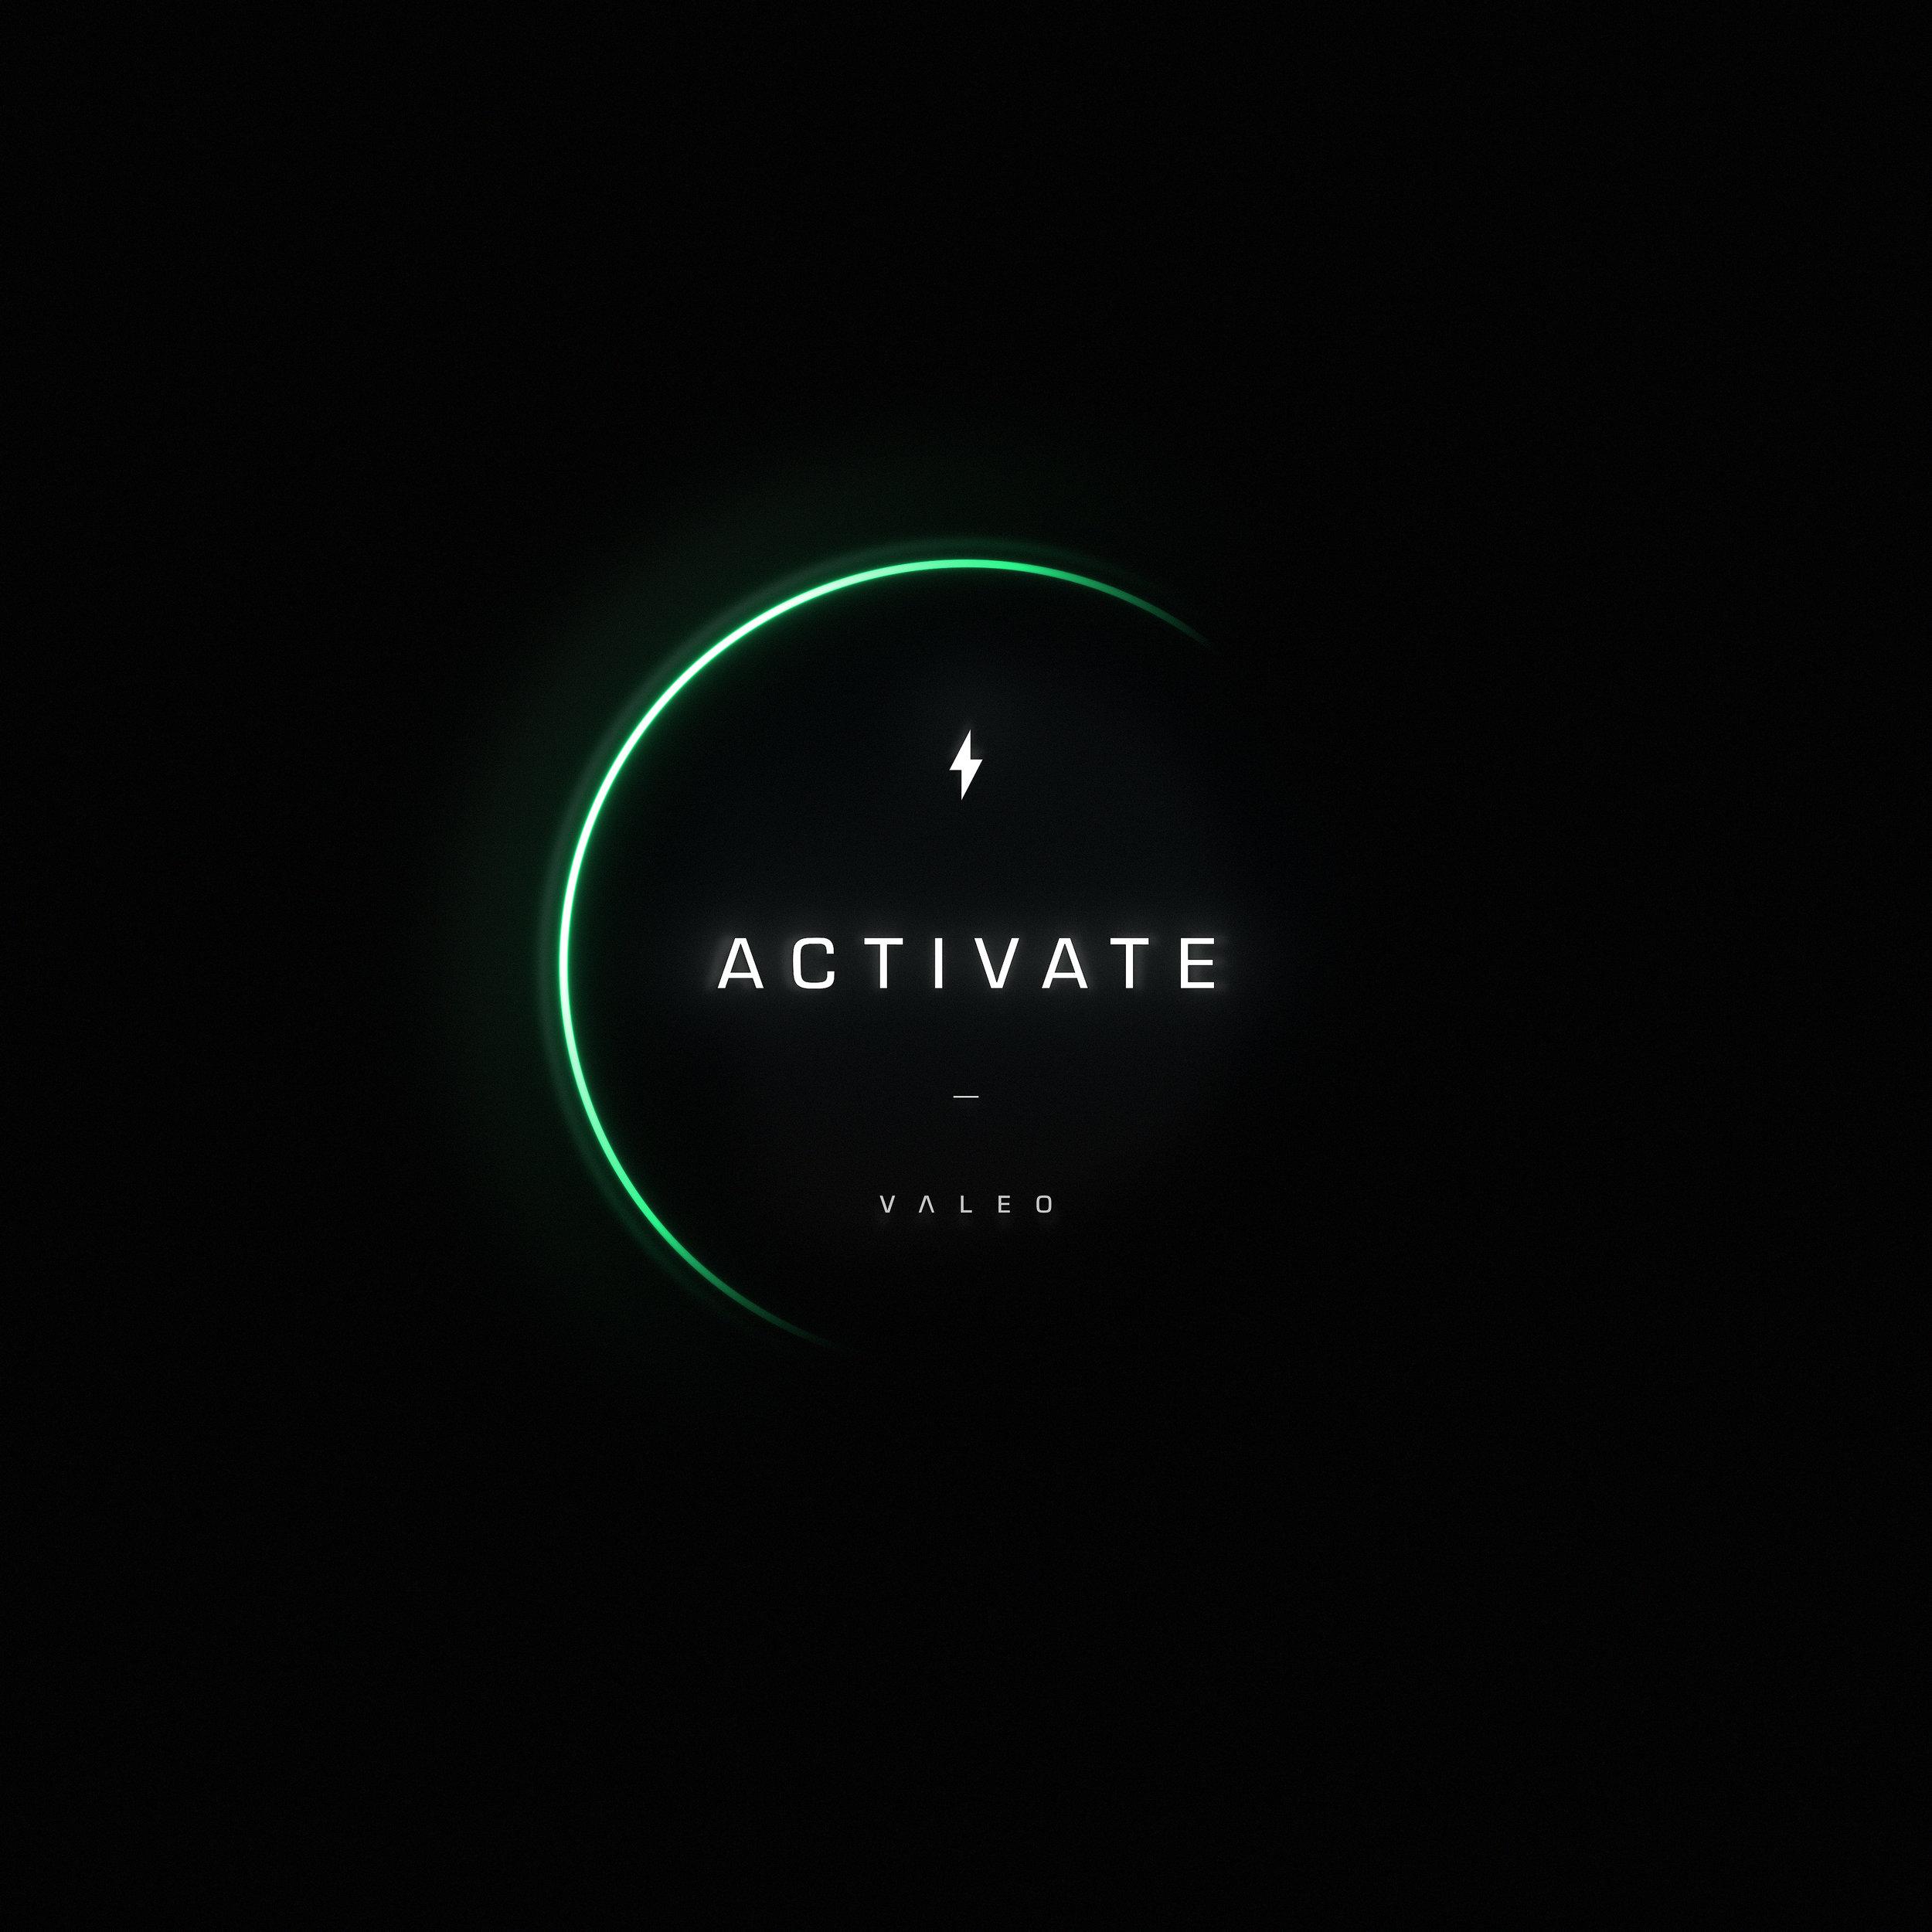 Valeo_Activate_04_Treated_01.jpg